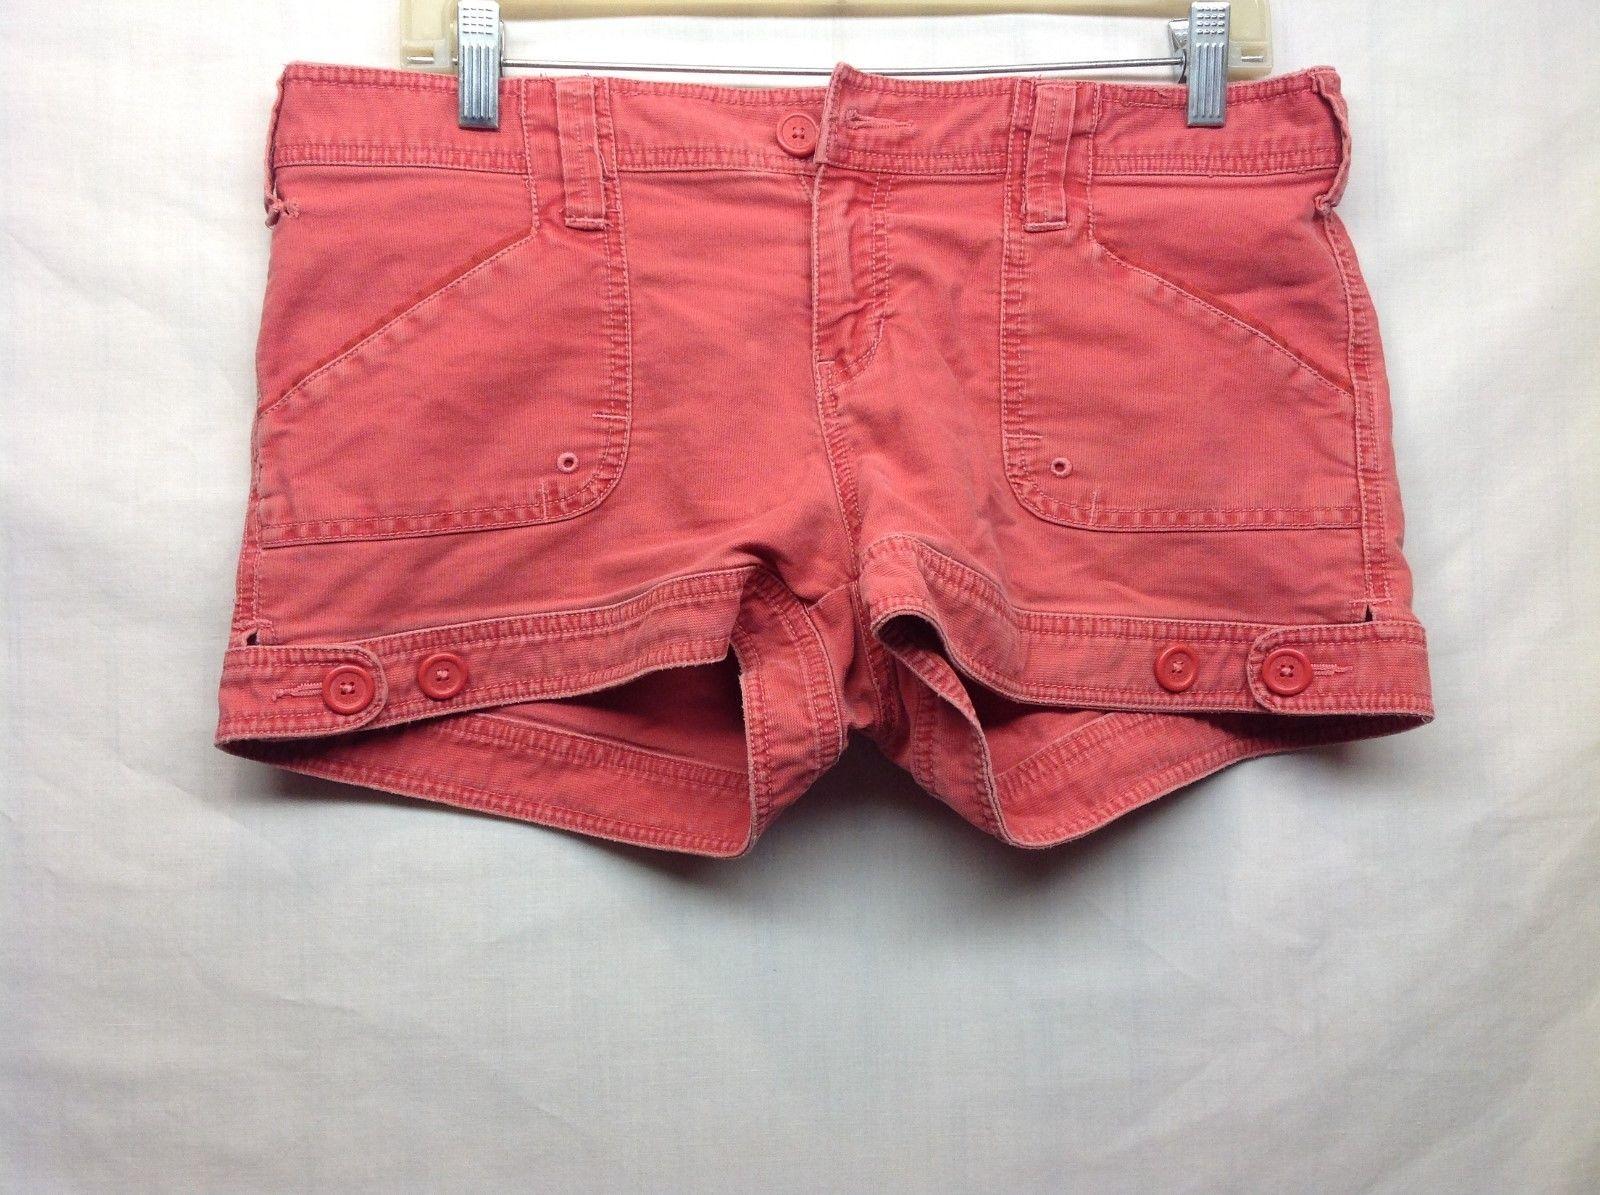 Aeropostale Salmon Colored Jean Shorts Sz 9-10